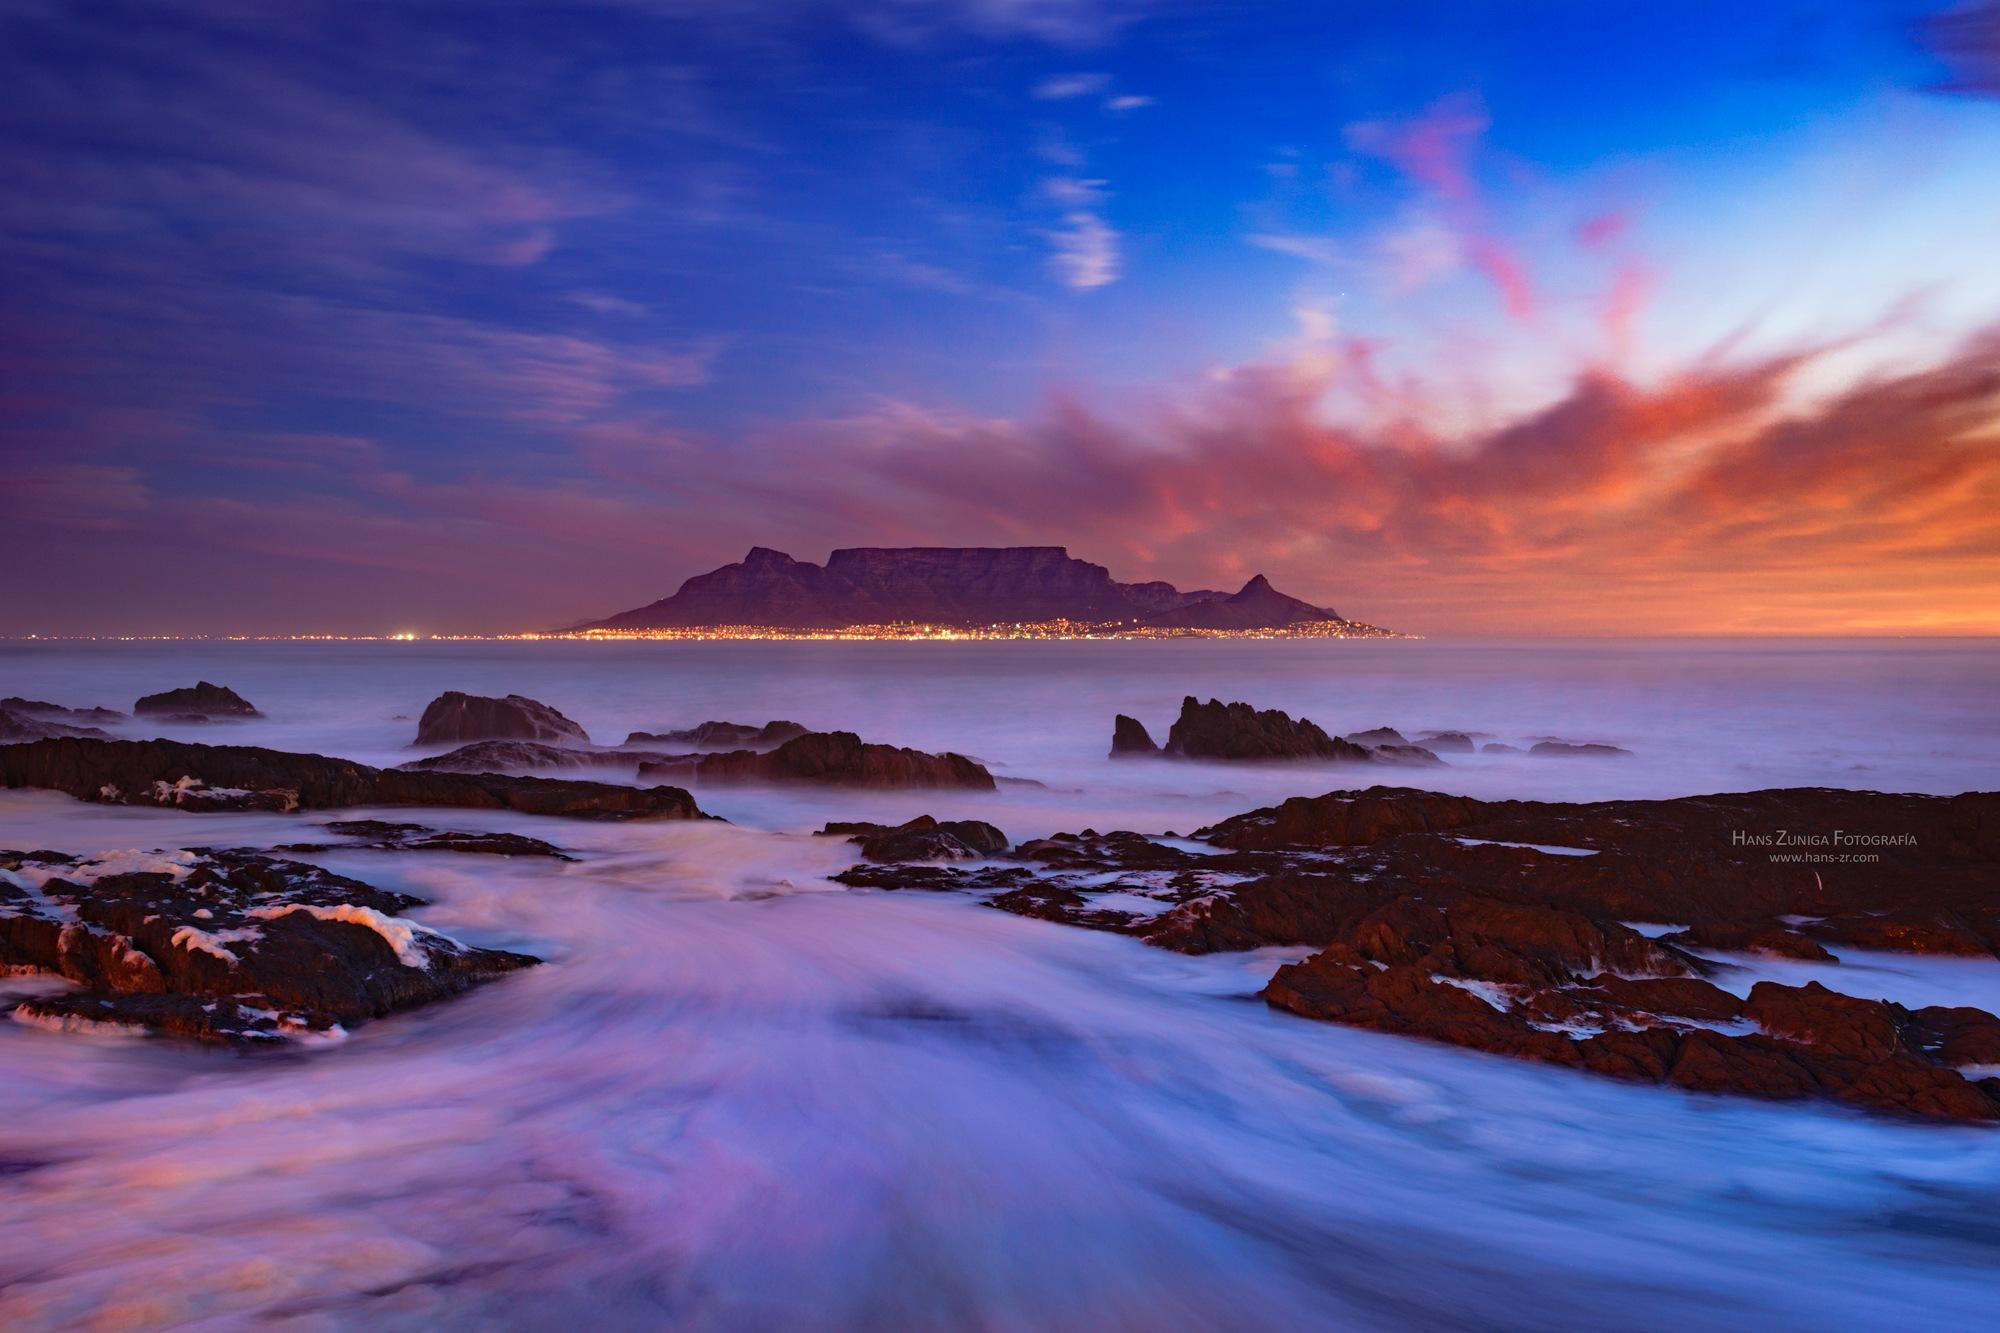 Table Mountain, Cape town by Hans Zuñiga Rojas